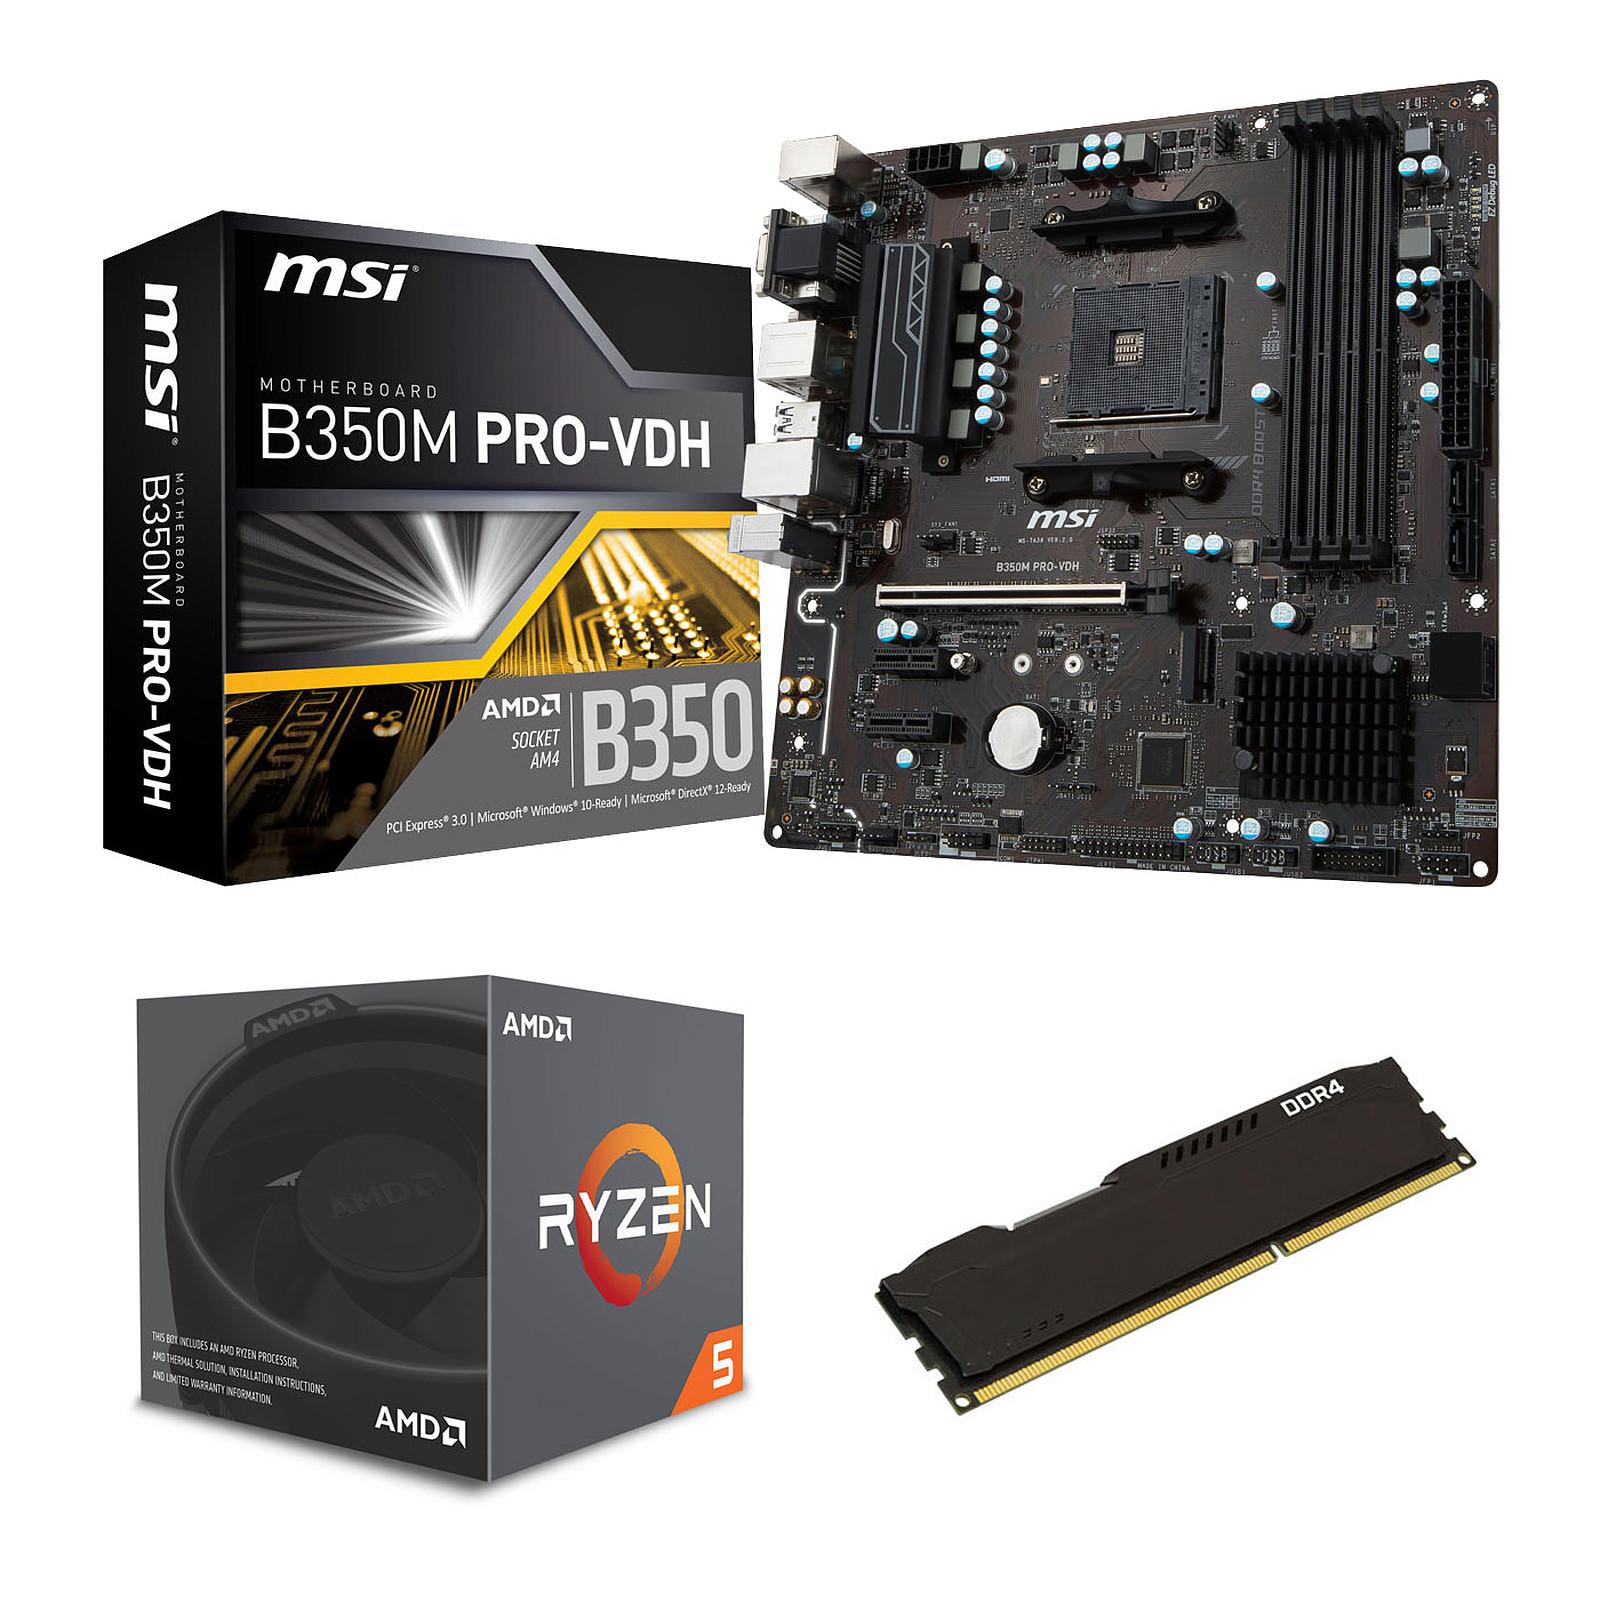 Kit Upgrade PC AMD Ryzen 5 1400 MSI B350M PRO-VDH 4 Go